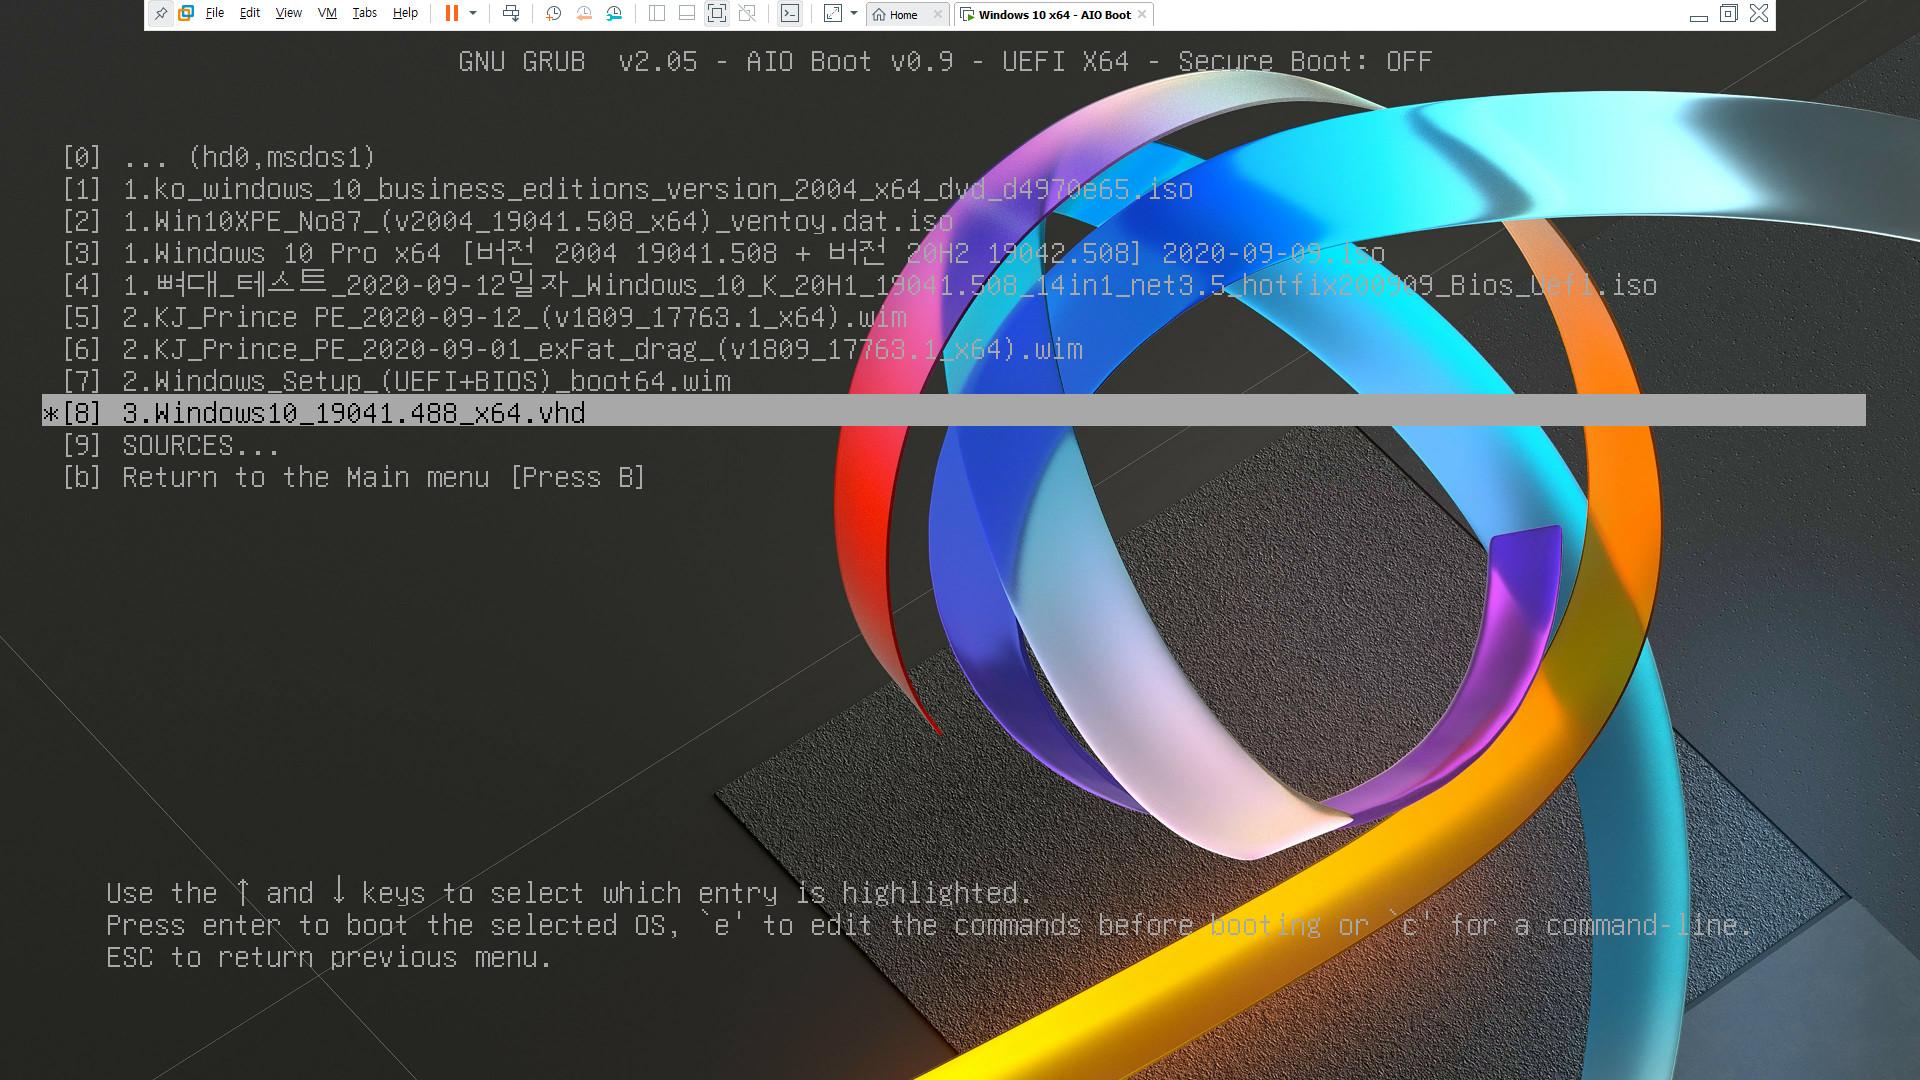 AIO Boot의 grubenv와 기타 설정하기2.bat 으로 설정 자동화하기 - 폰트 파일과 배경 사진 복사 가능 2020-09-13_131644.jpg